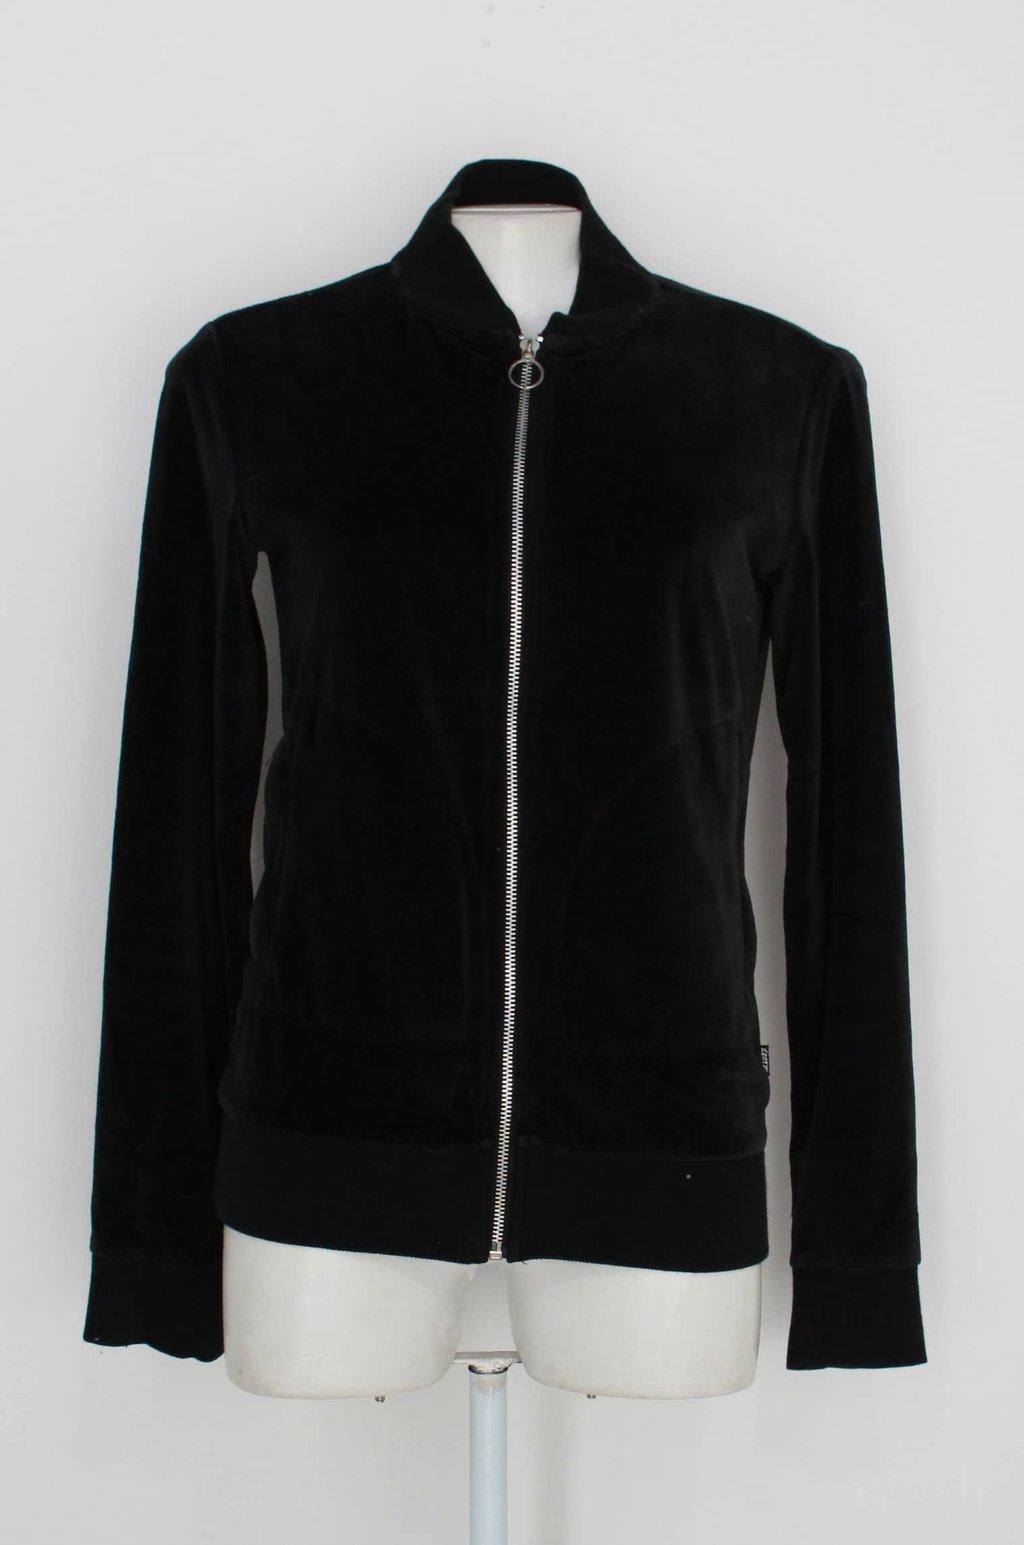 Oferta jaqueta Bomber dzarm. feminina preta por R$ 73